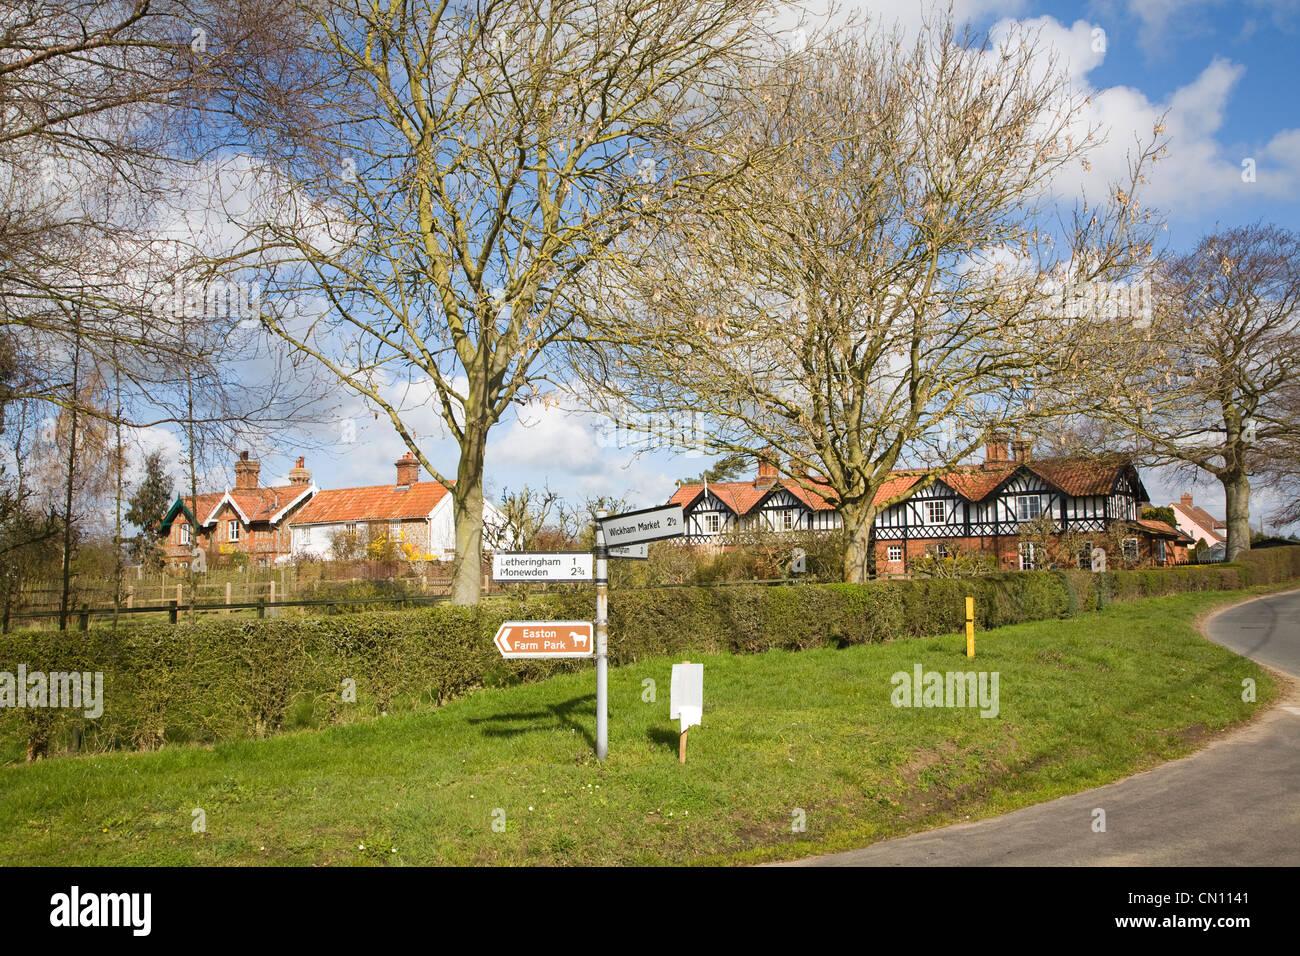 Pretty leafless tree village houses Easton, Suffolk, England - Stock Image